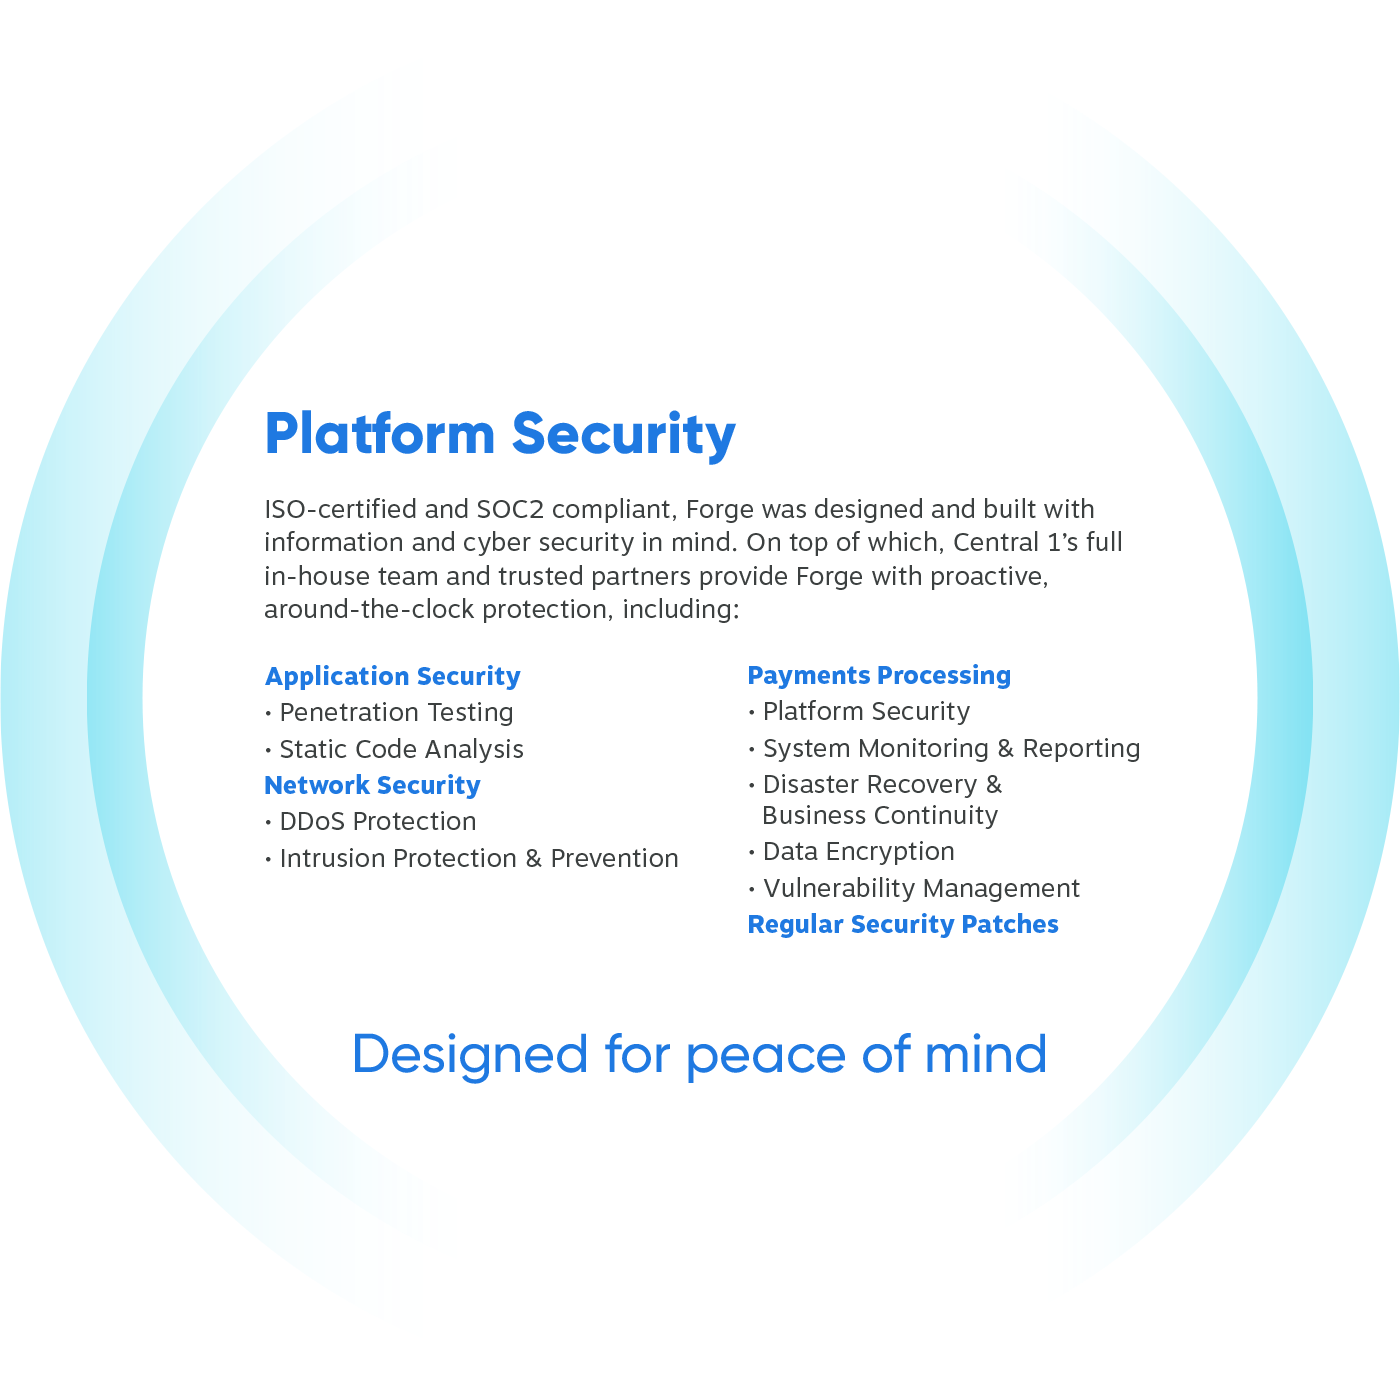 Platform Security Layer